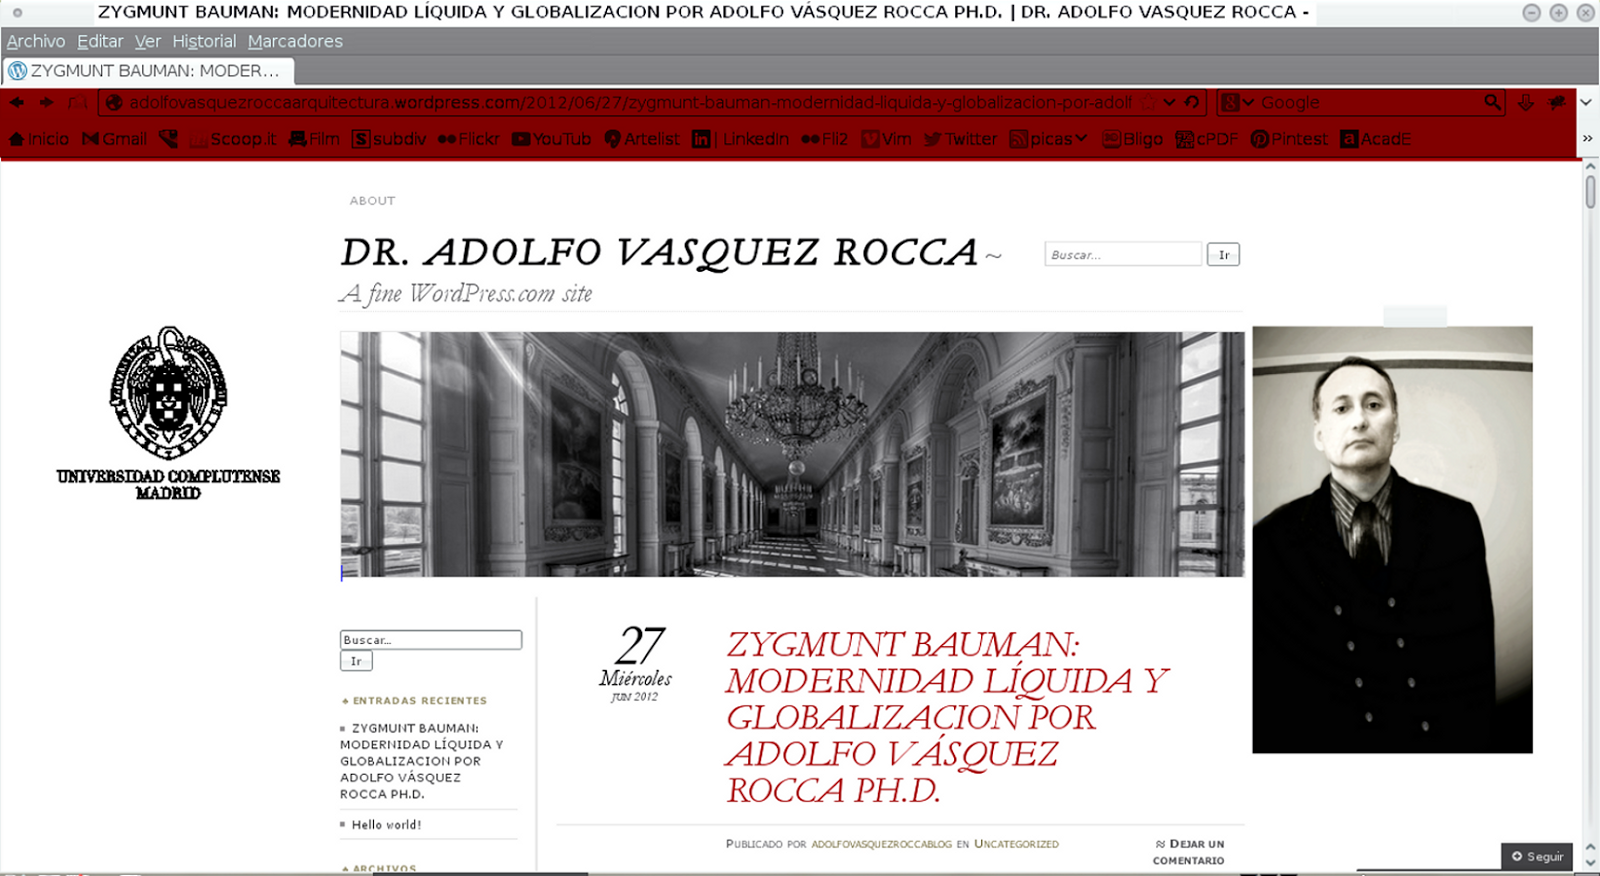 http://4.bp.blogspot.com/-aTDehn39dsY/Uqjg1EX-QTI/AAAAAAAAMTY/4p6rO-DgoXA/s1600/Seminario+Z.+BAUMAN+_+Modernidad+L%C3%ADquida+_+Dr.+Adolfo+V%C3%A1squez+Rocca.png